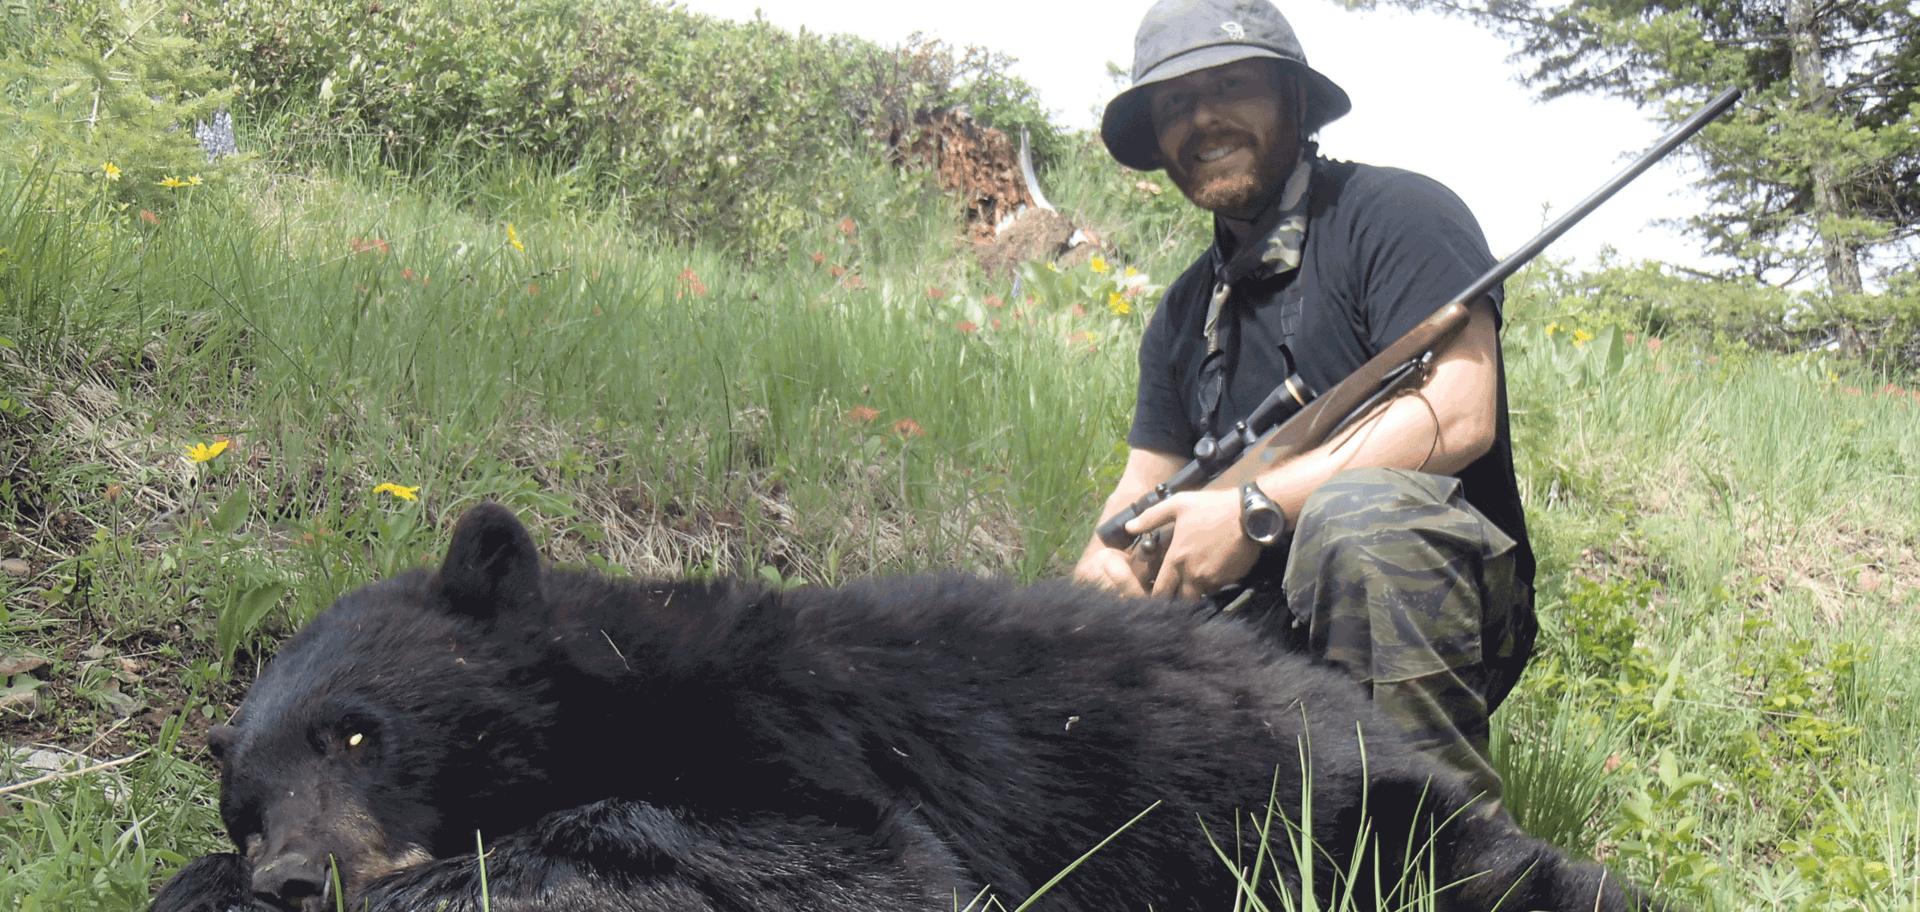 Black bear hunting Montana, Color phase bear